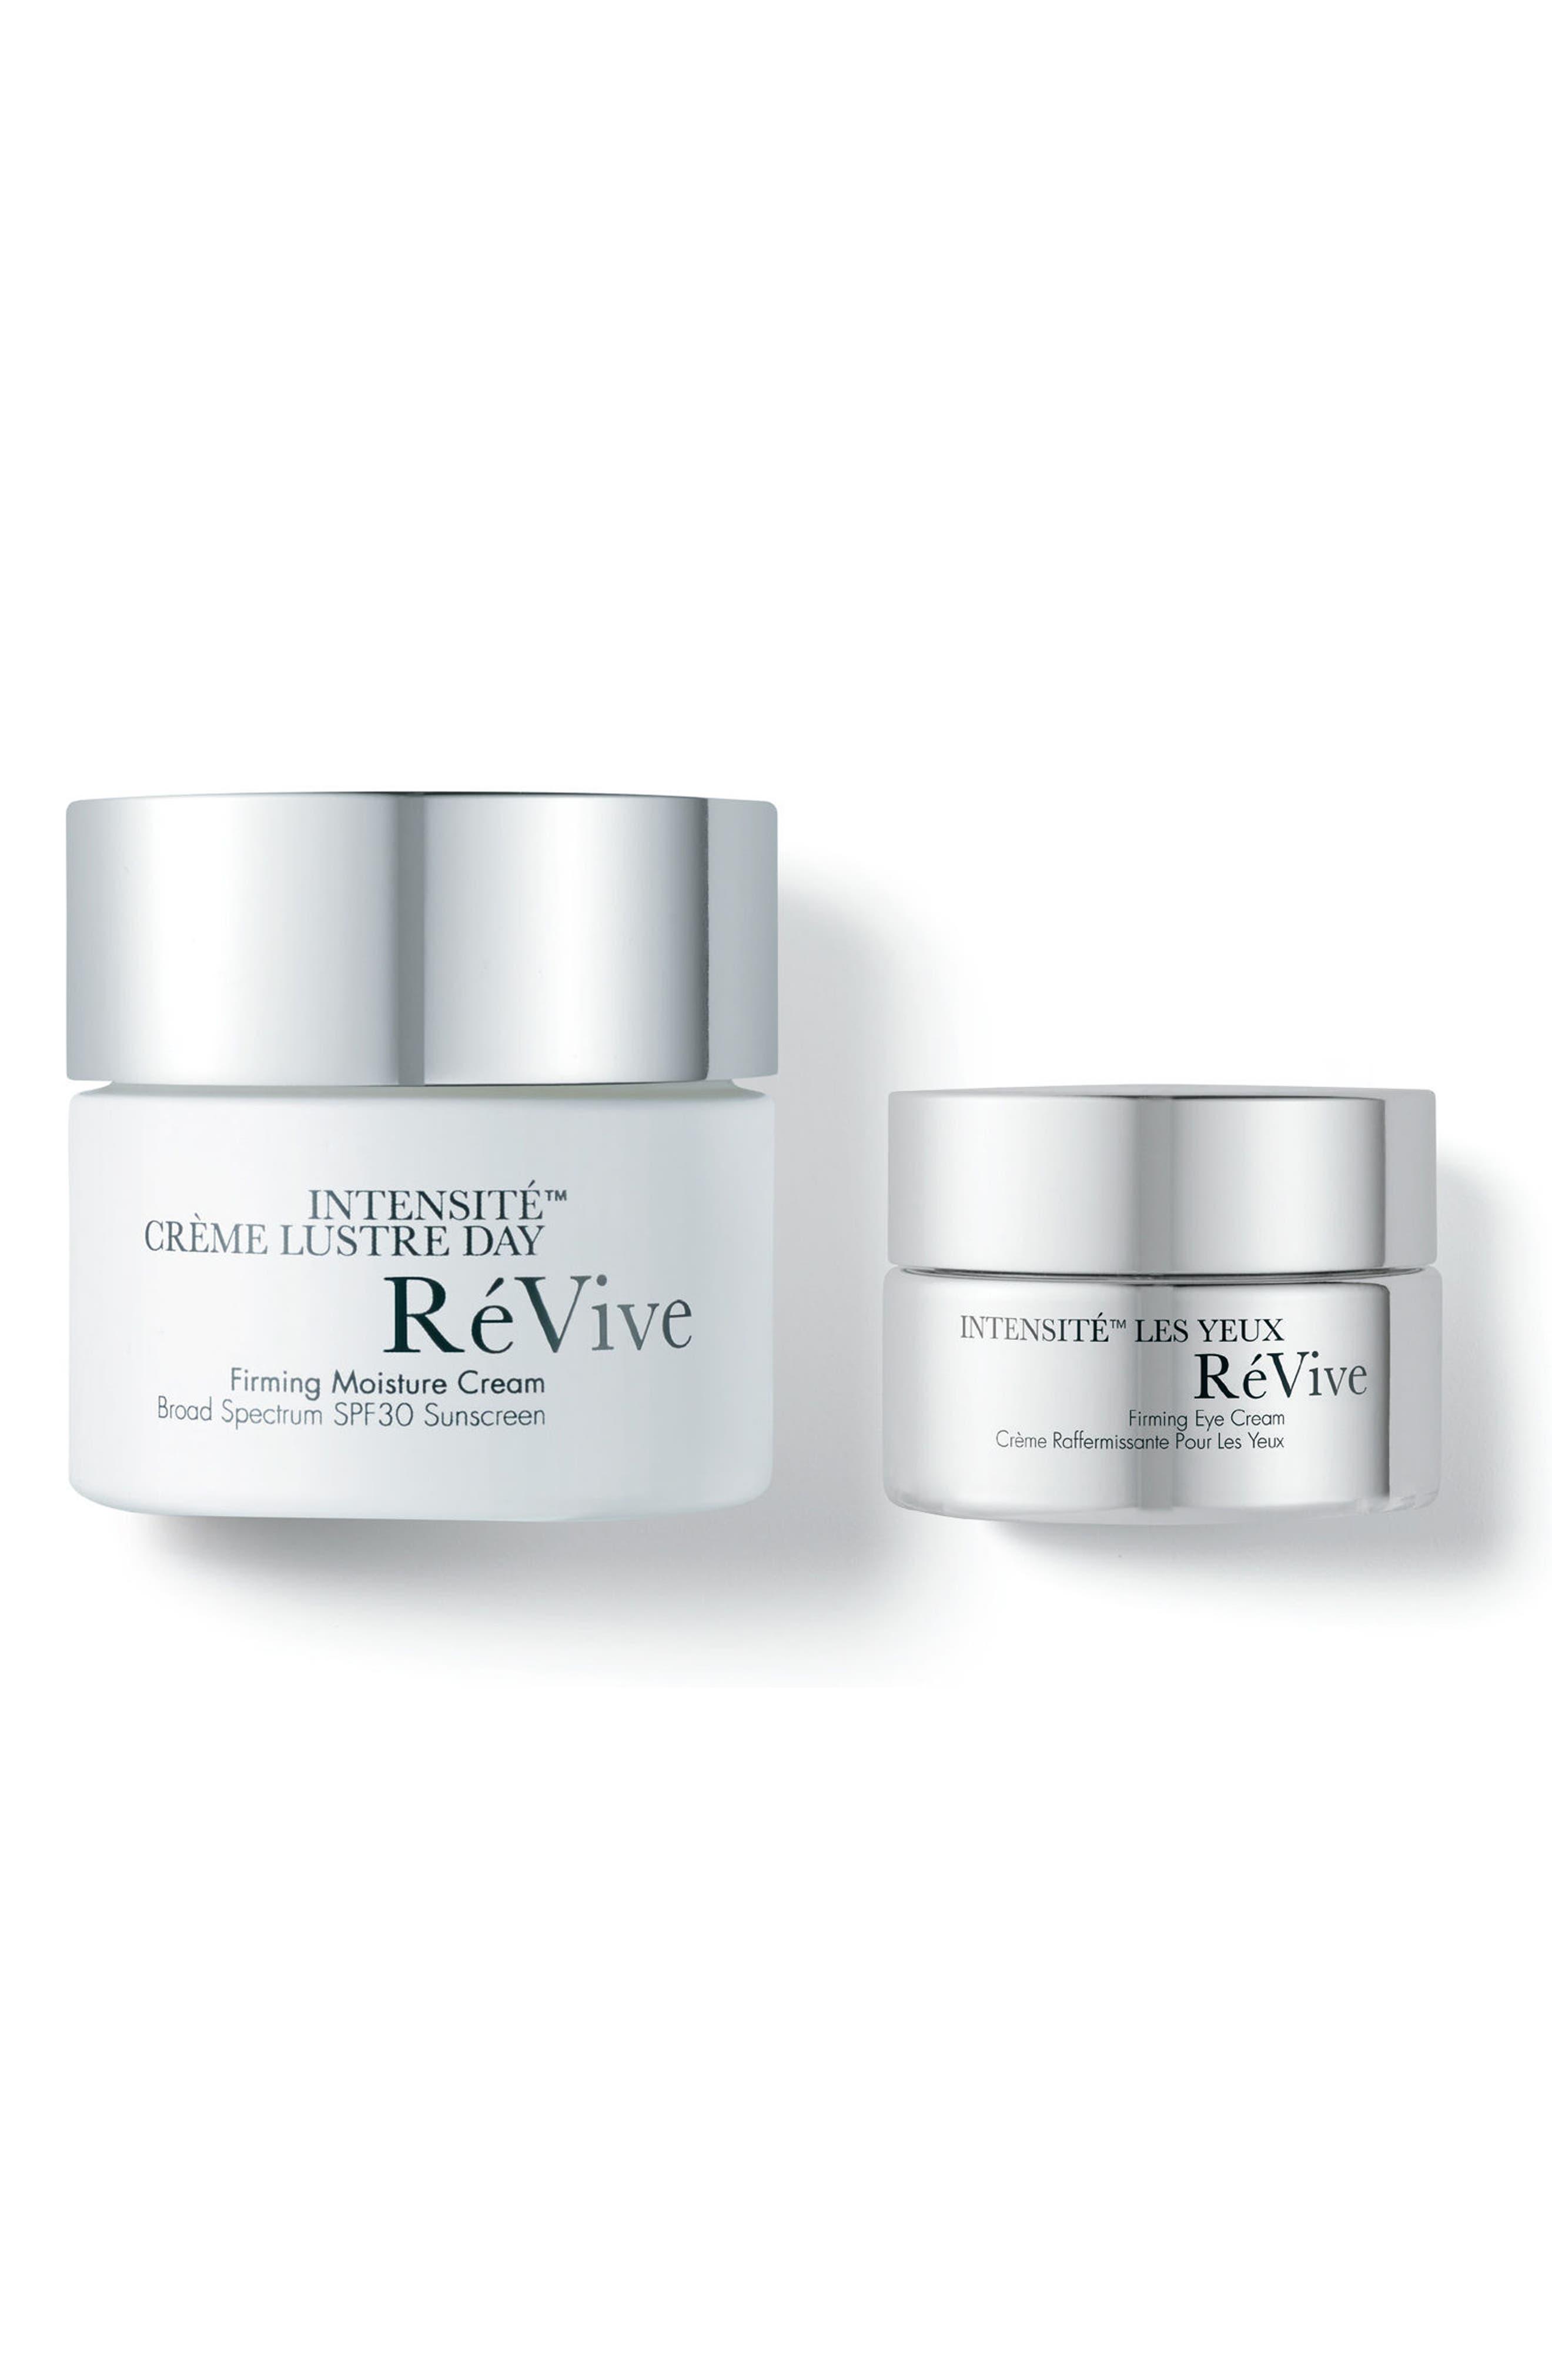 Revive Moisturizing Renewal Cream Broad Spectrum Spf 15 Sunscreen